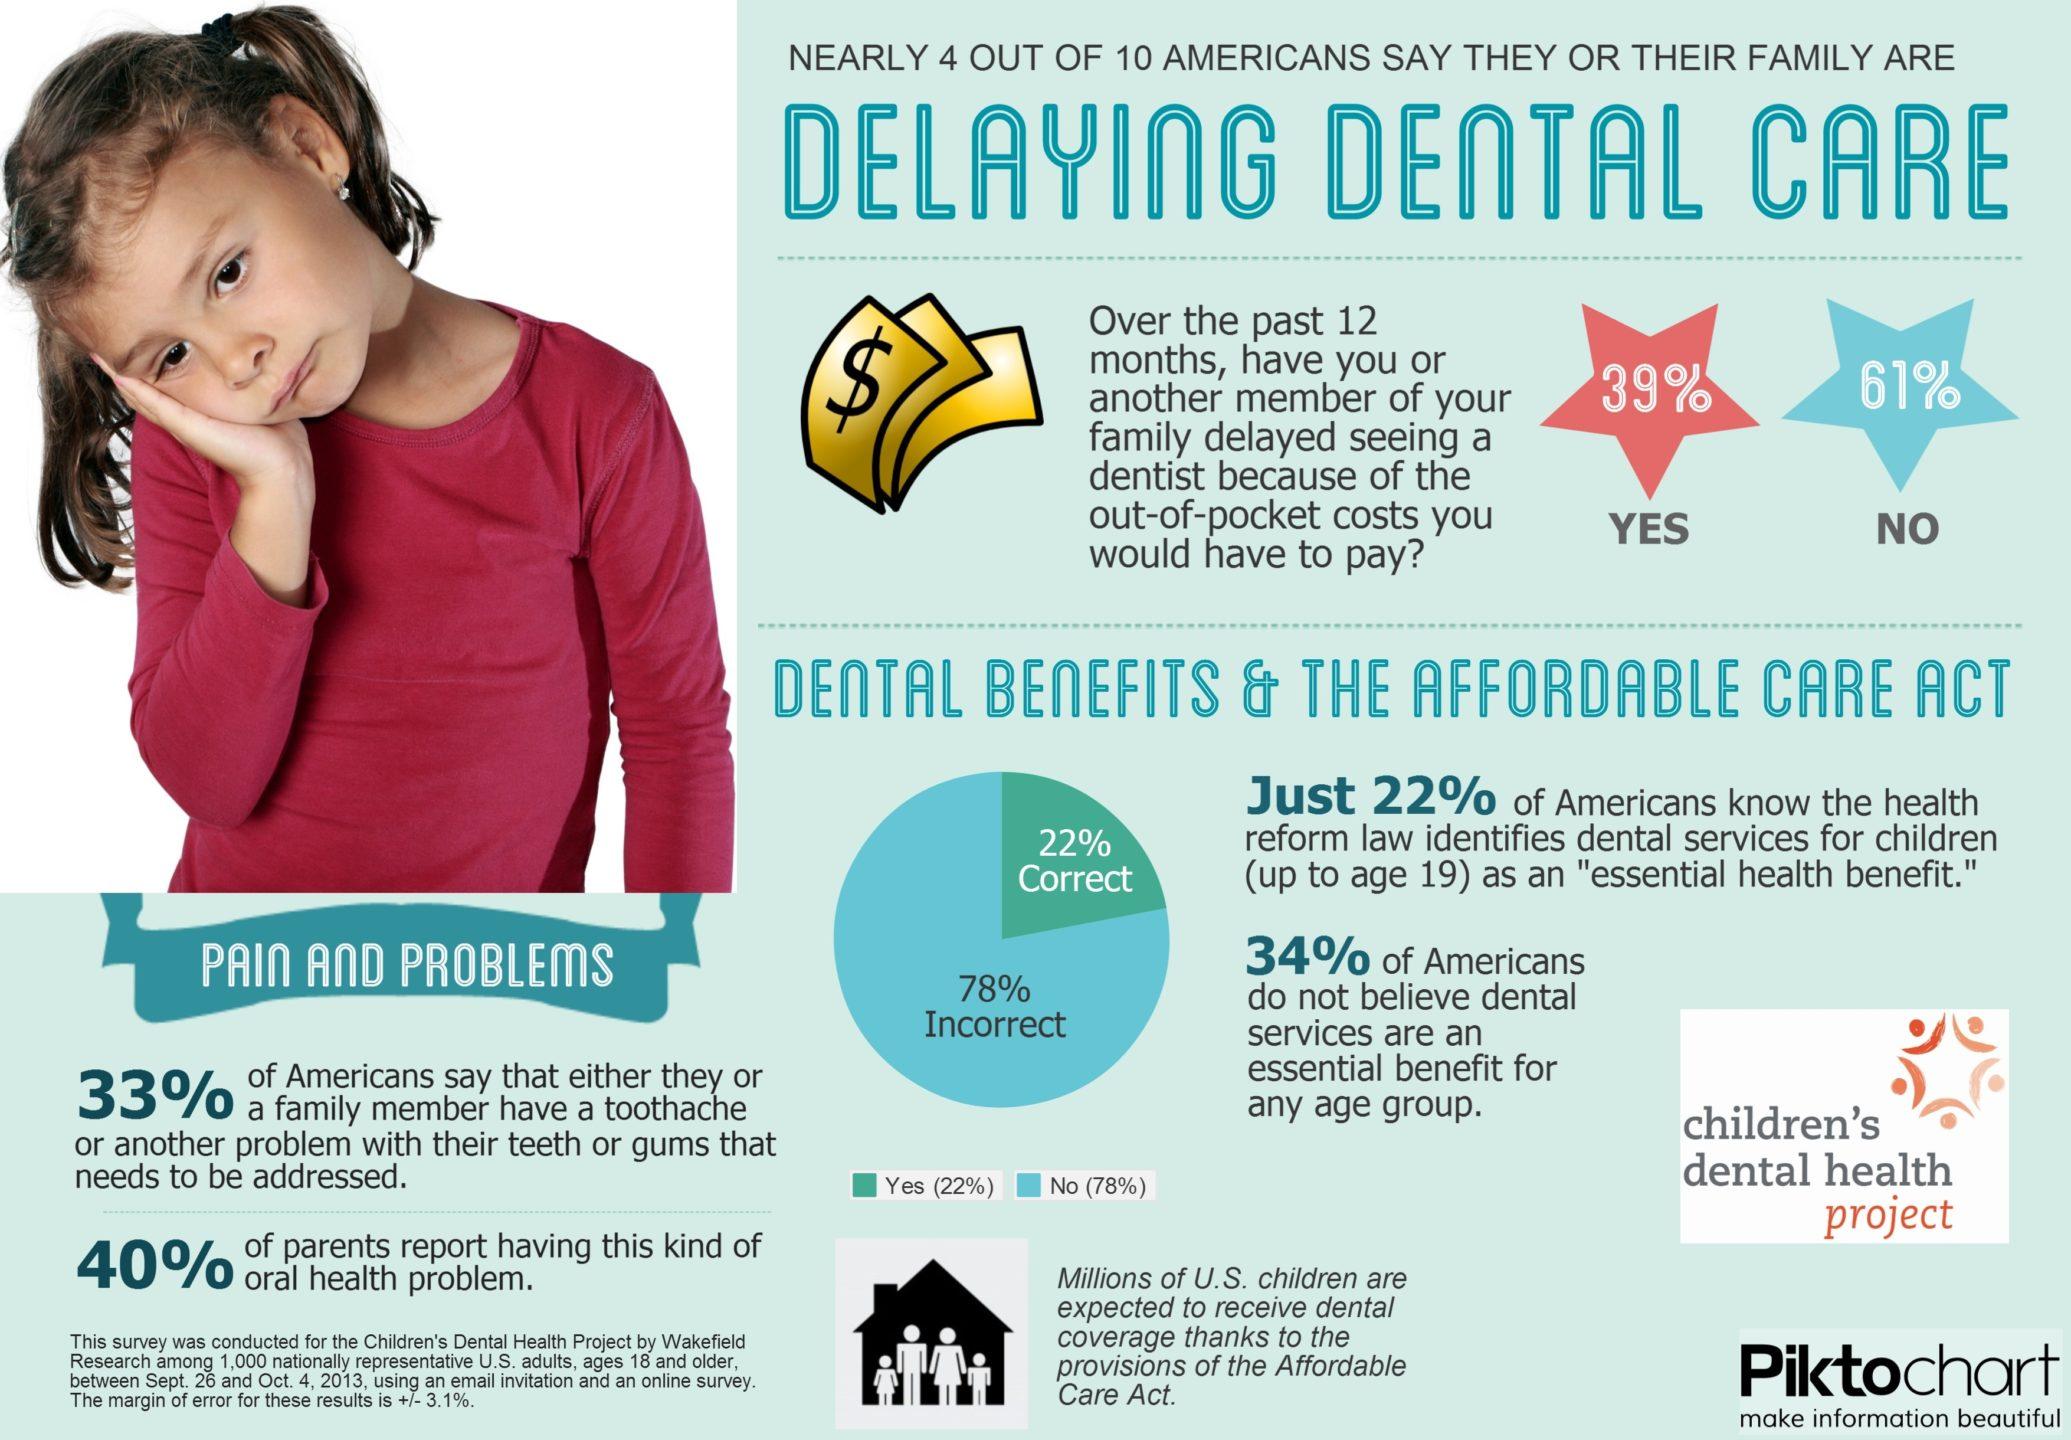 delaying-dental-care.jpg